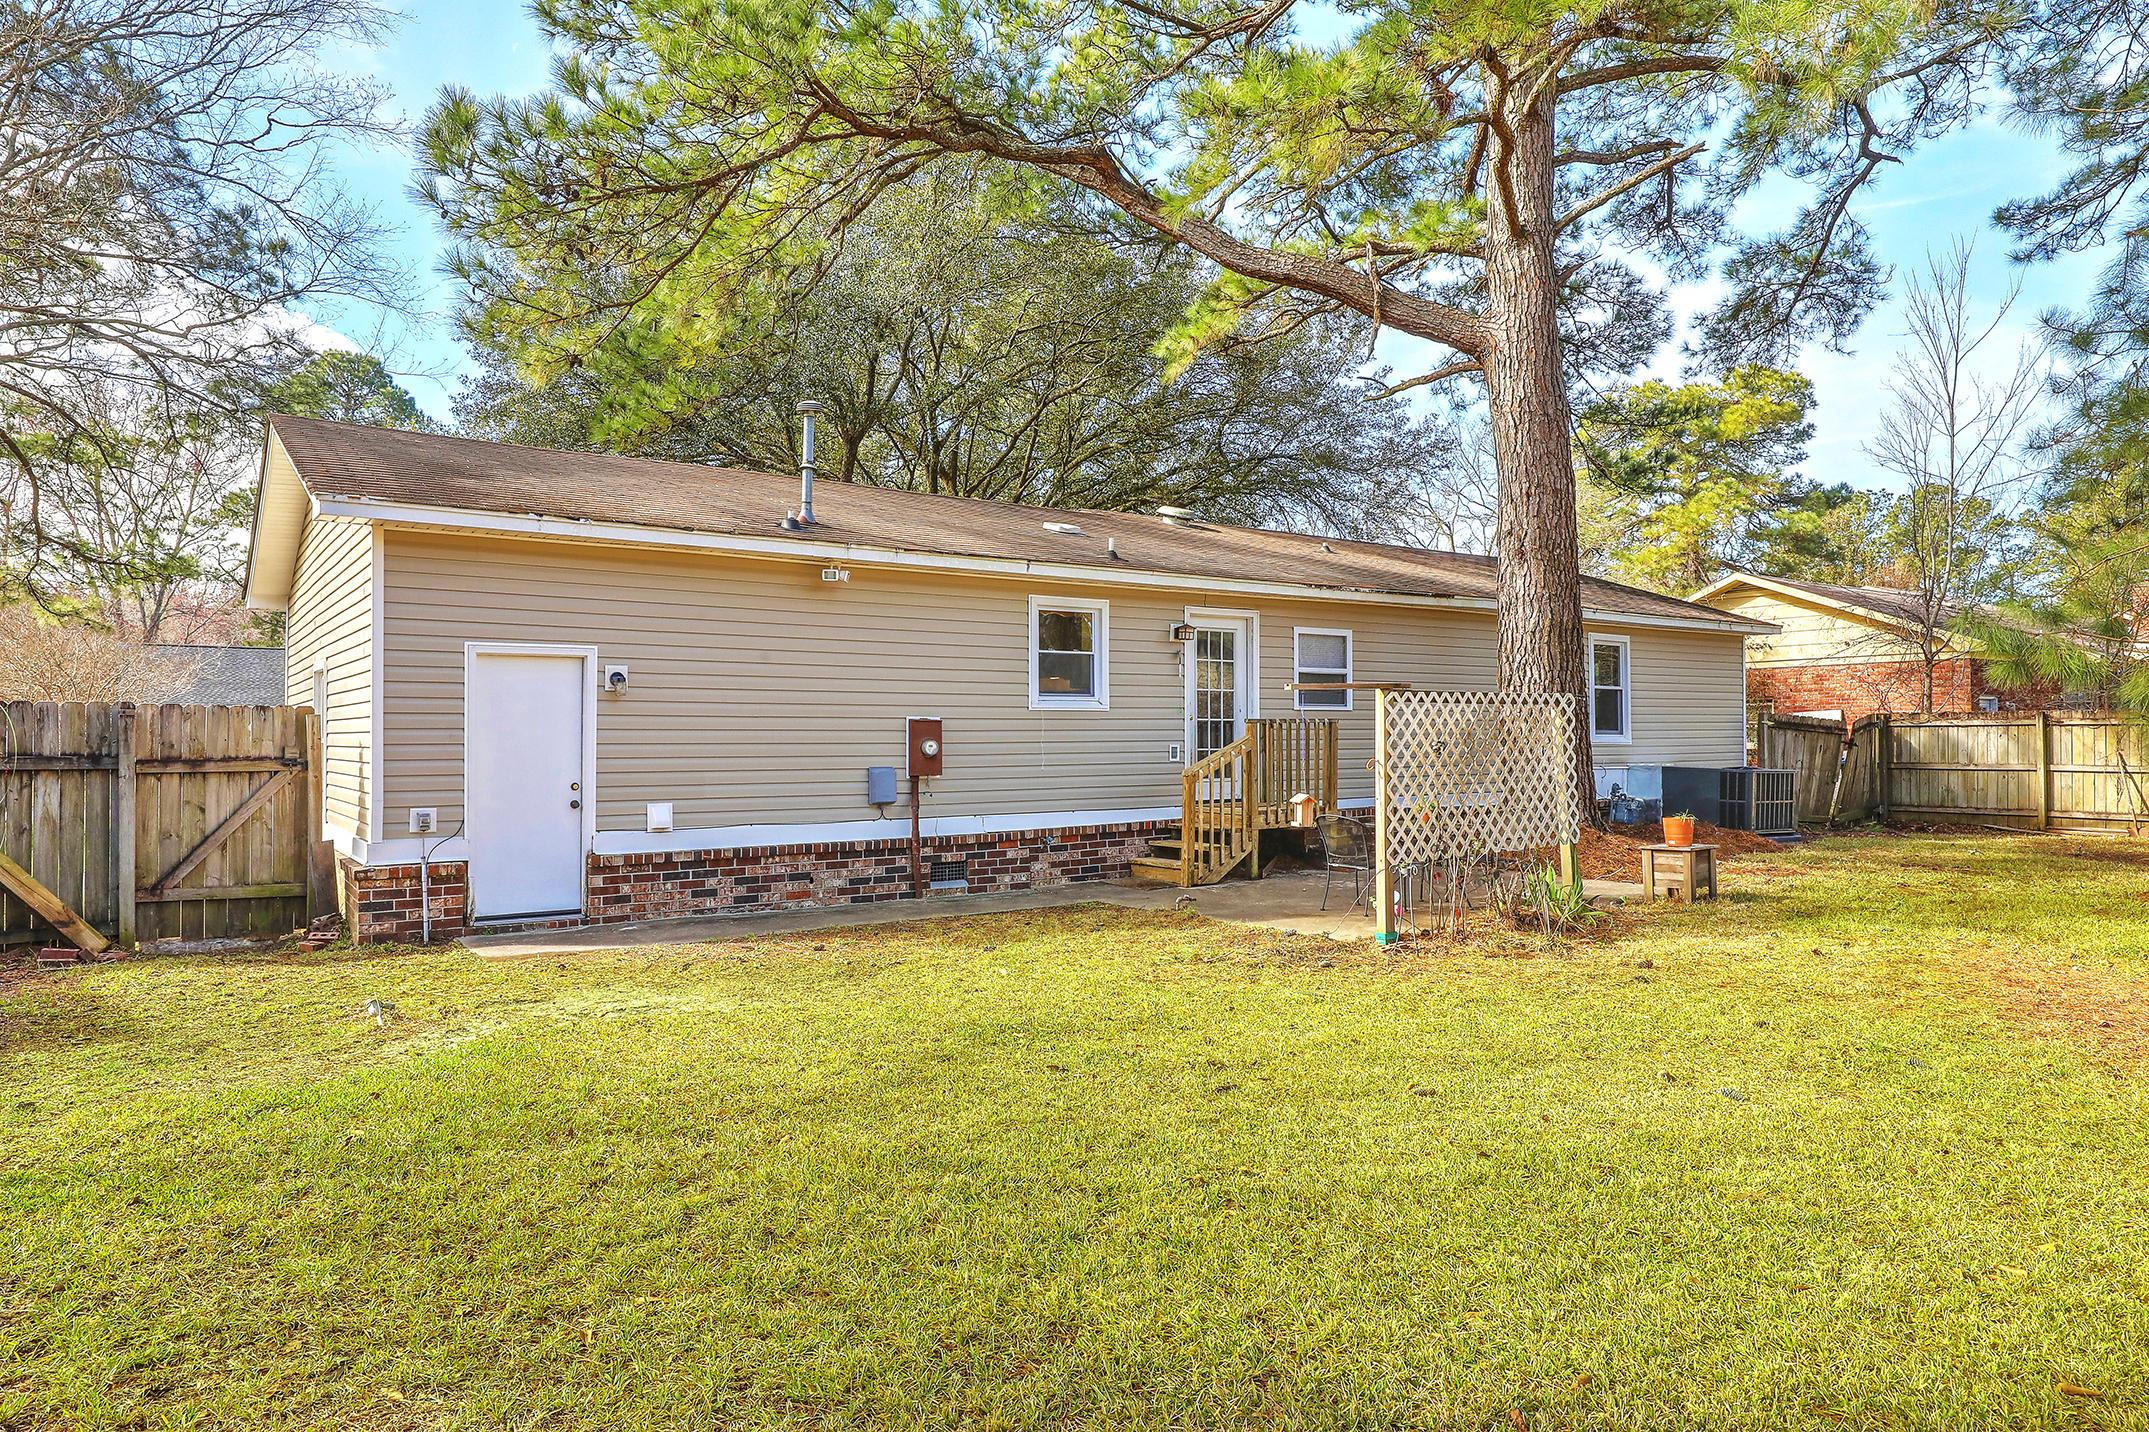 105 Sandtrap Road Summerville, SC 29483